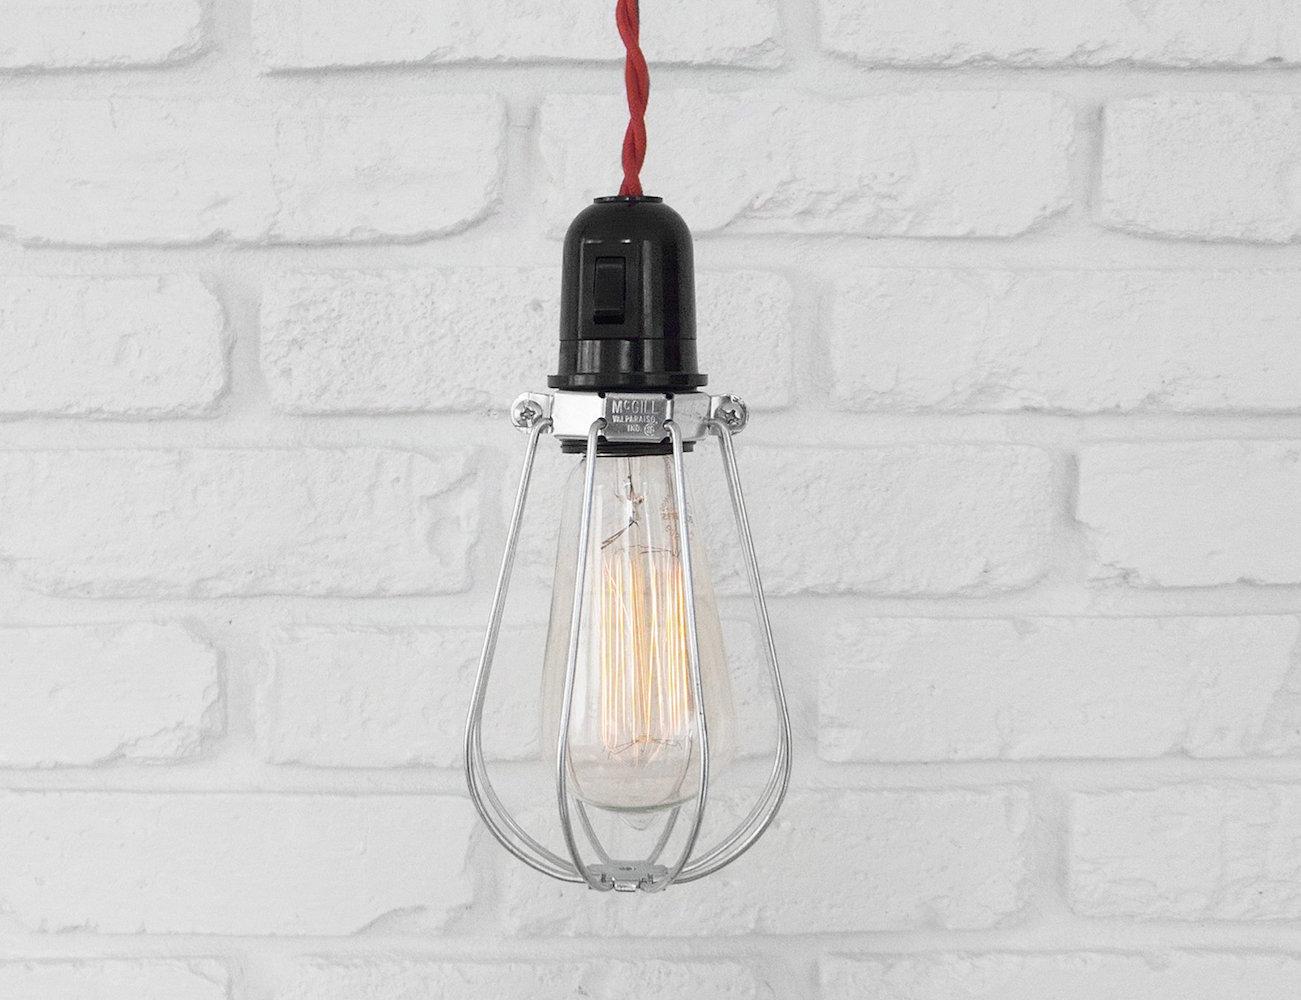 The Morton Lamp – Handmade Vintage Hanging Pendant Lamp